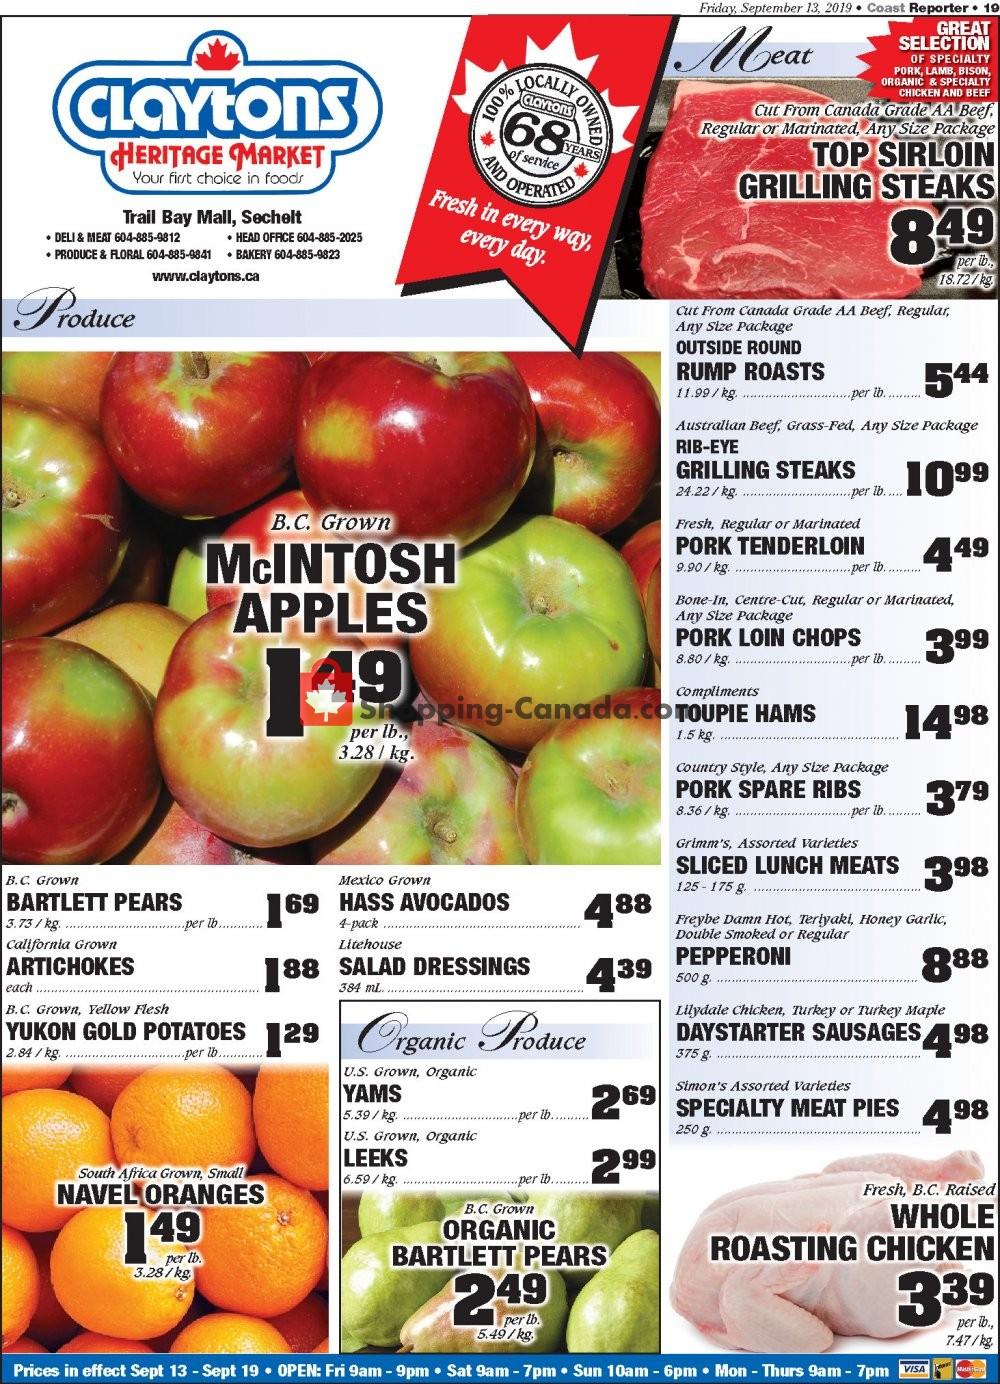 Flyer Claytons Heritage Market Canada - from Friday September 13, 2019 to Thursday September 19, 2019